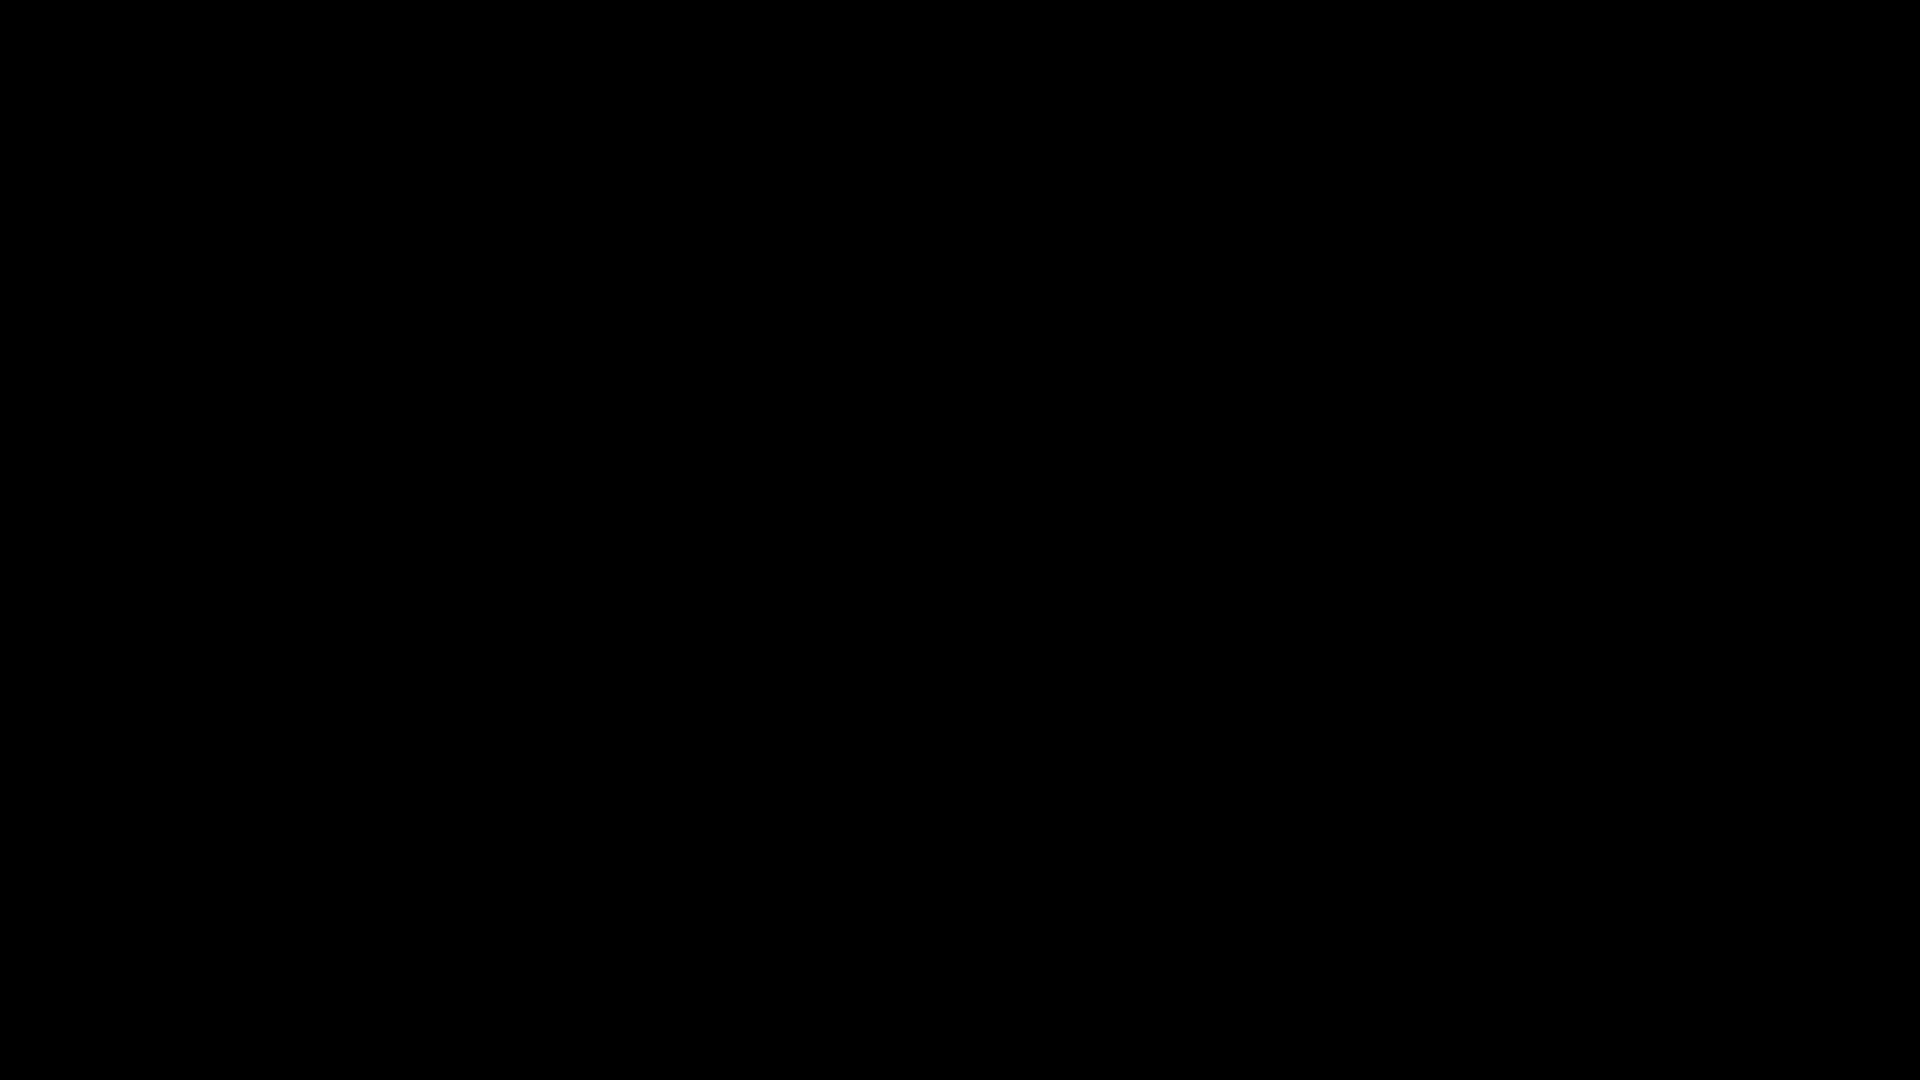 Entertainment, best of the worst, half in the bag, jay bauman, last jedi, letter, media, mike stokasa, nerd crew, plinkett, podcast, red, red letter media, redlettermedia, rich evans, star wars, the last jedi, The Nerd Crew: Episode 2 GIFs